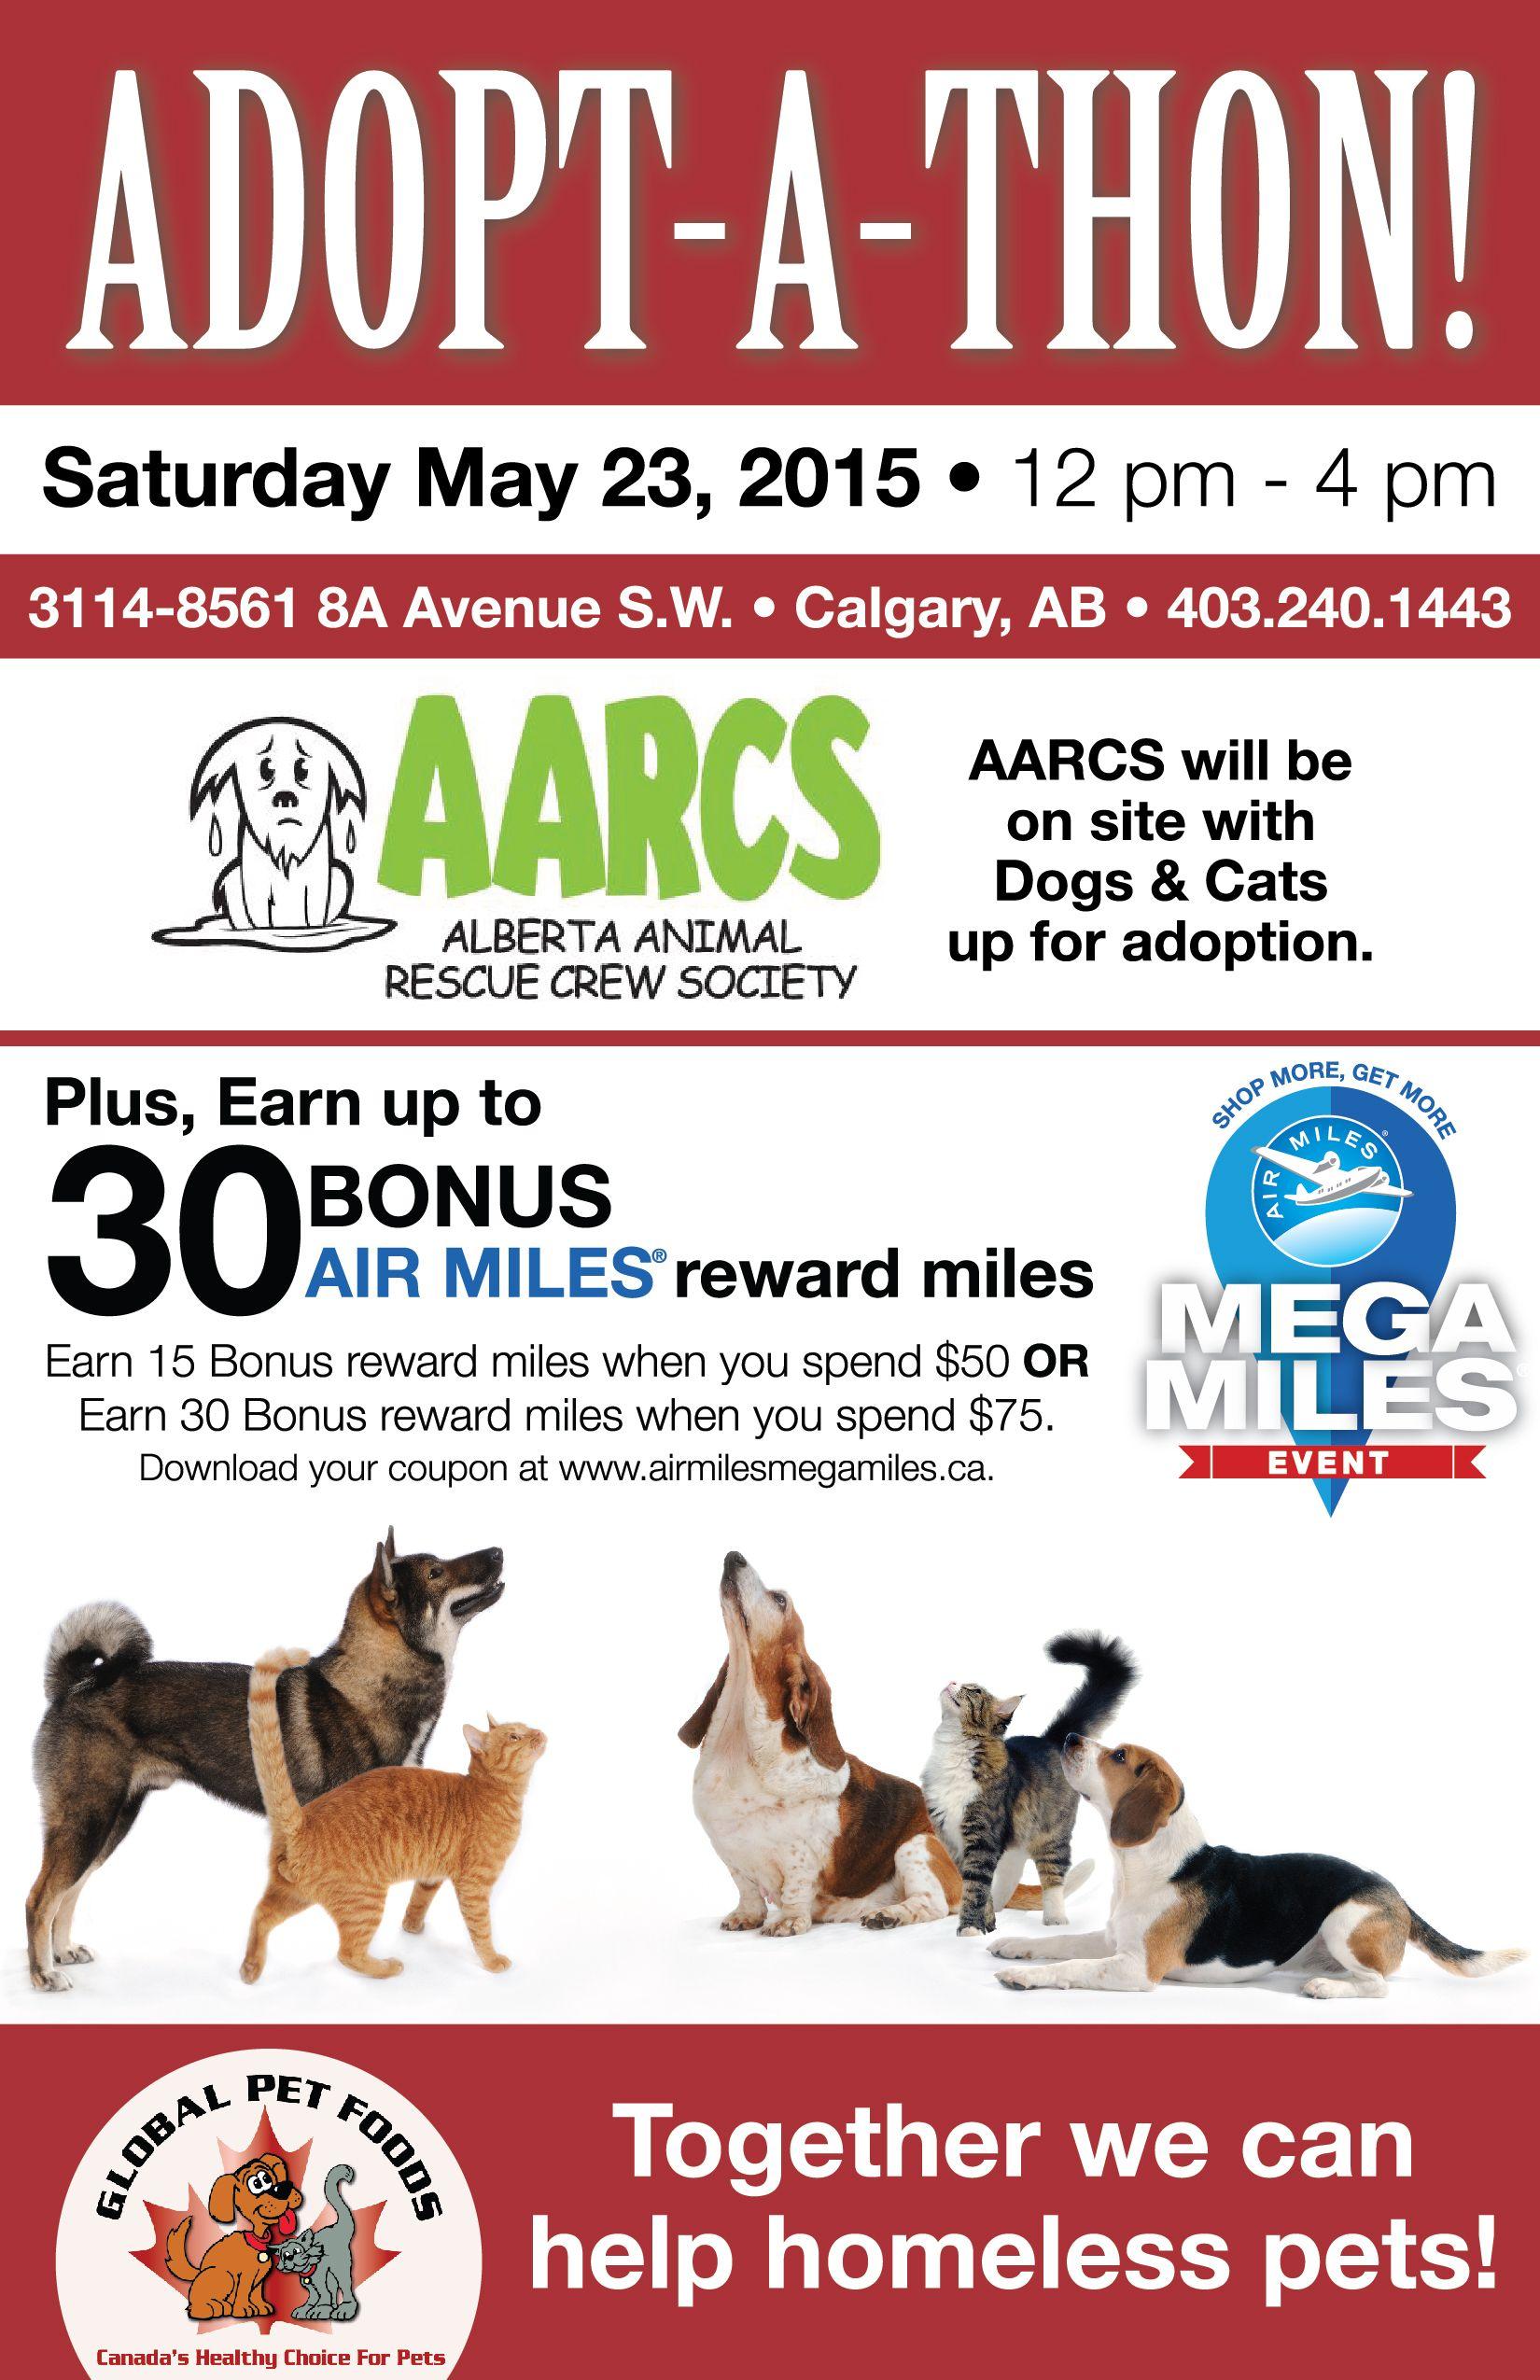 the alberta animal rescue crew society aarcs will be on site